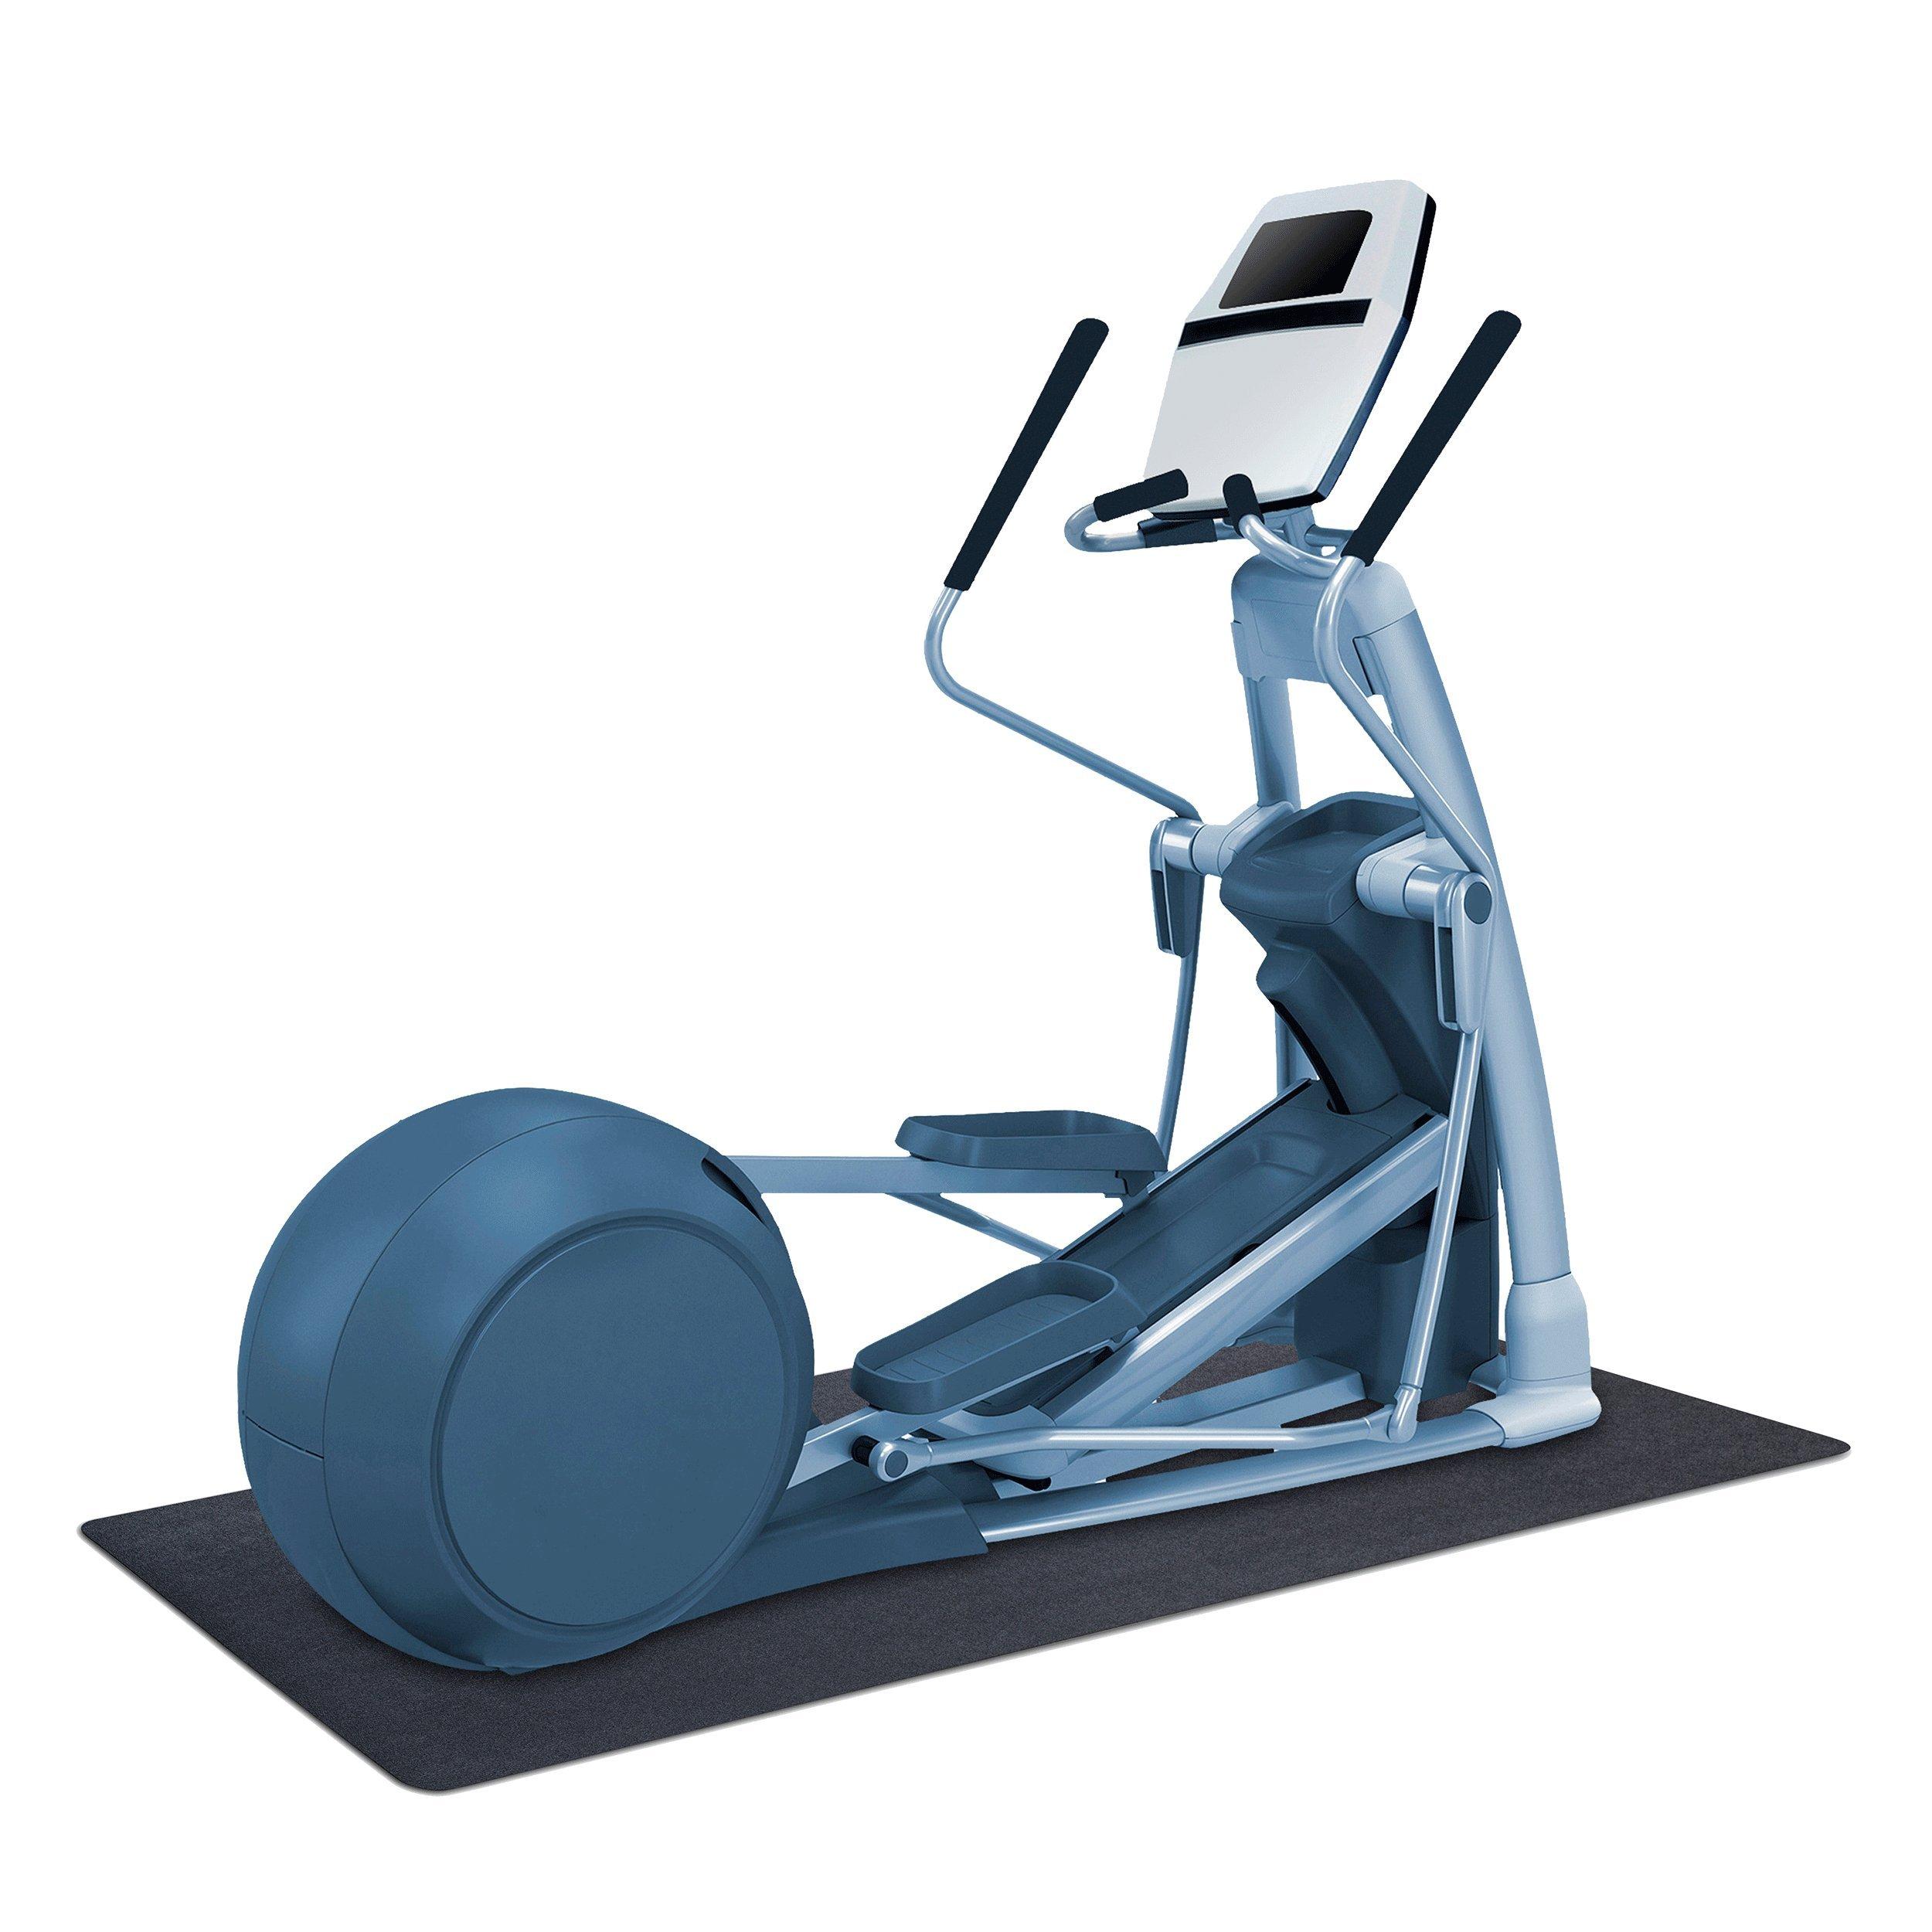 MotionTex 8M-110-30C-6.5 Fitness Equipment Mat, 30'' x 78'', Black